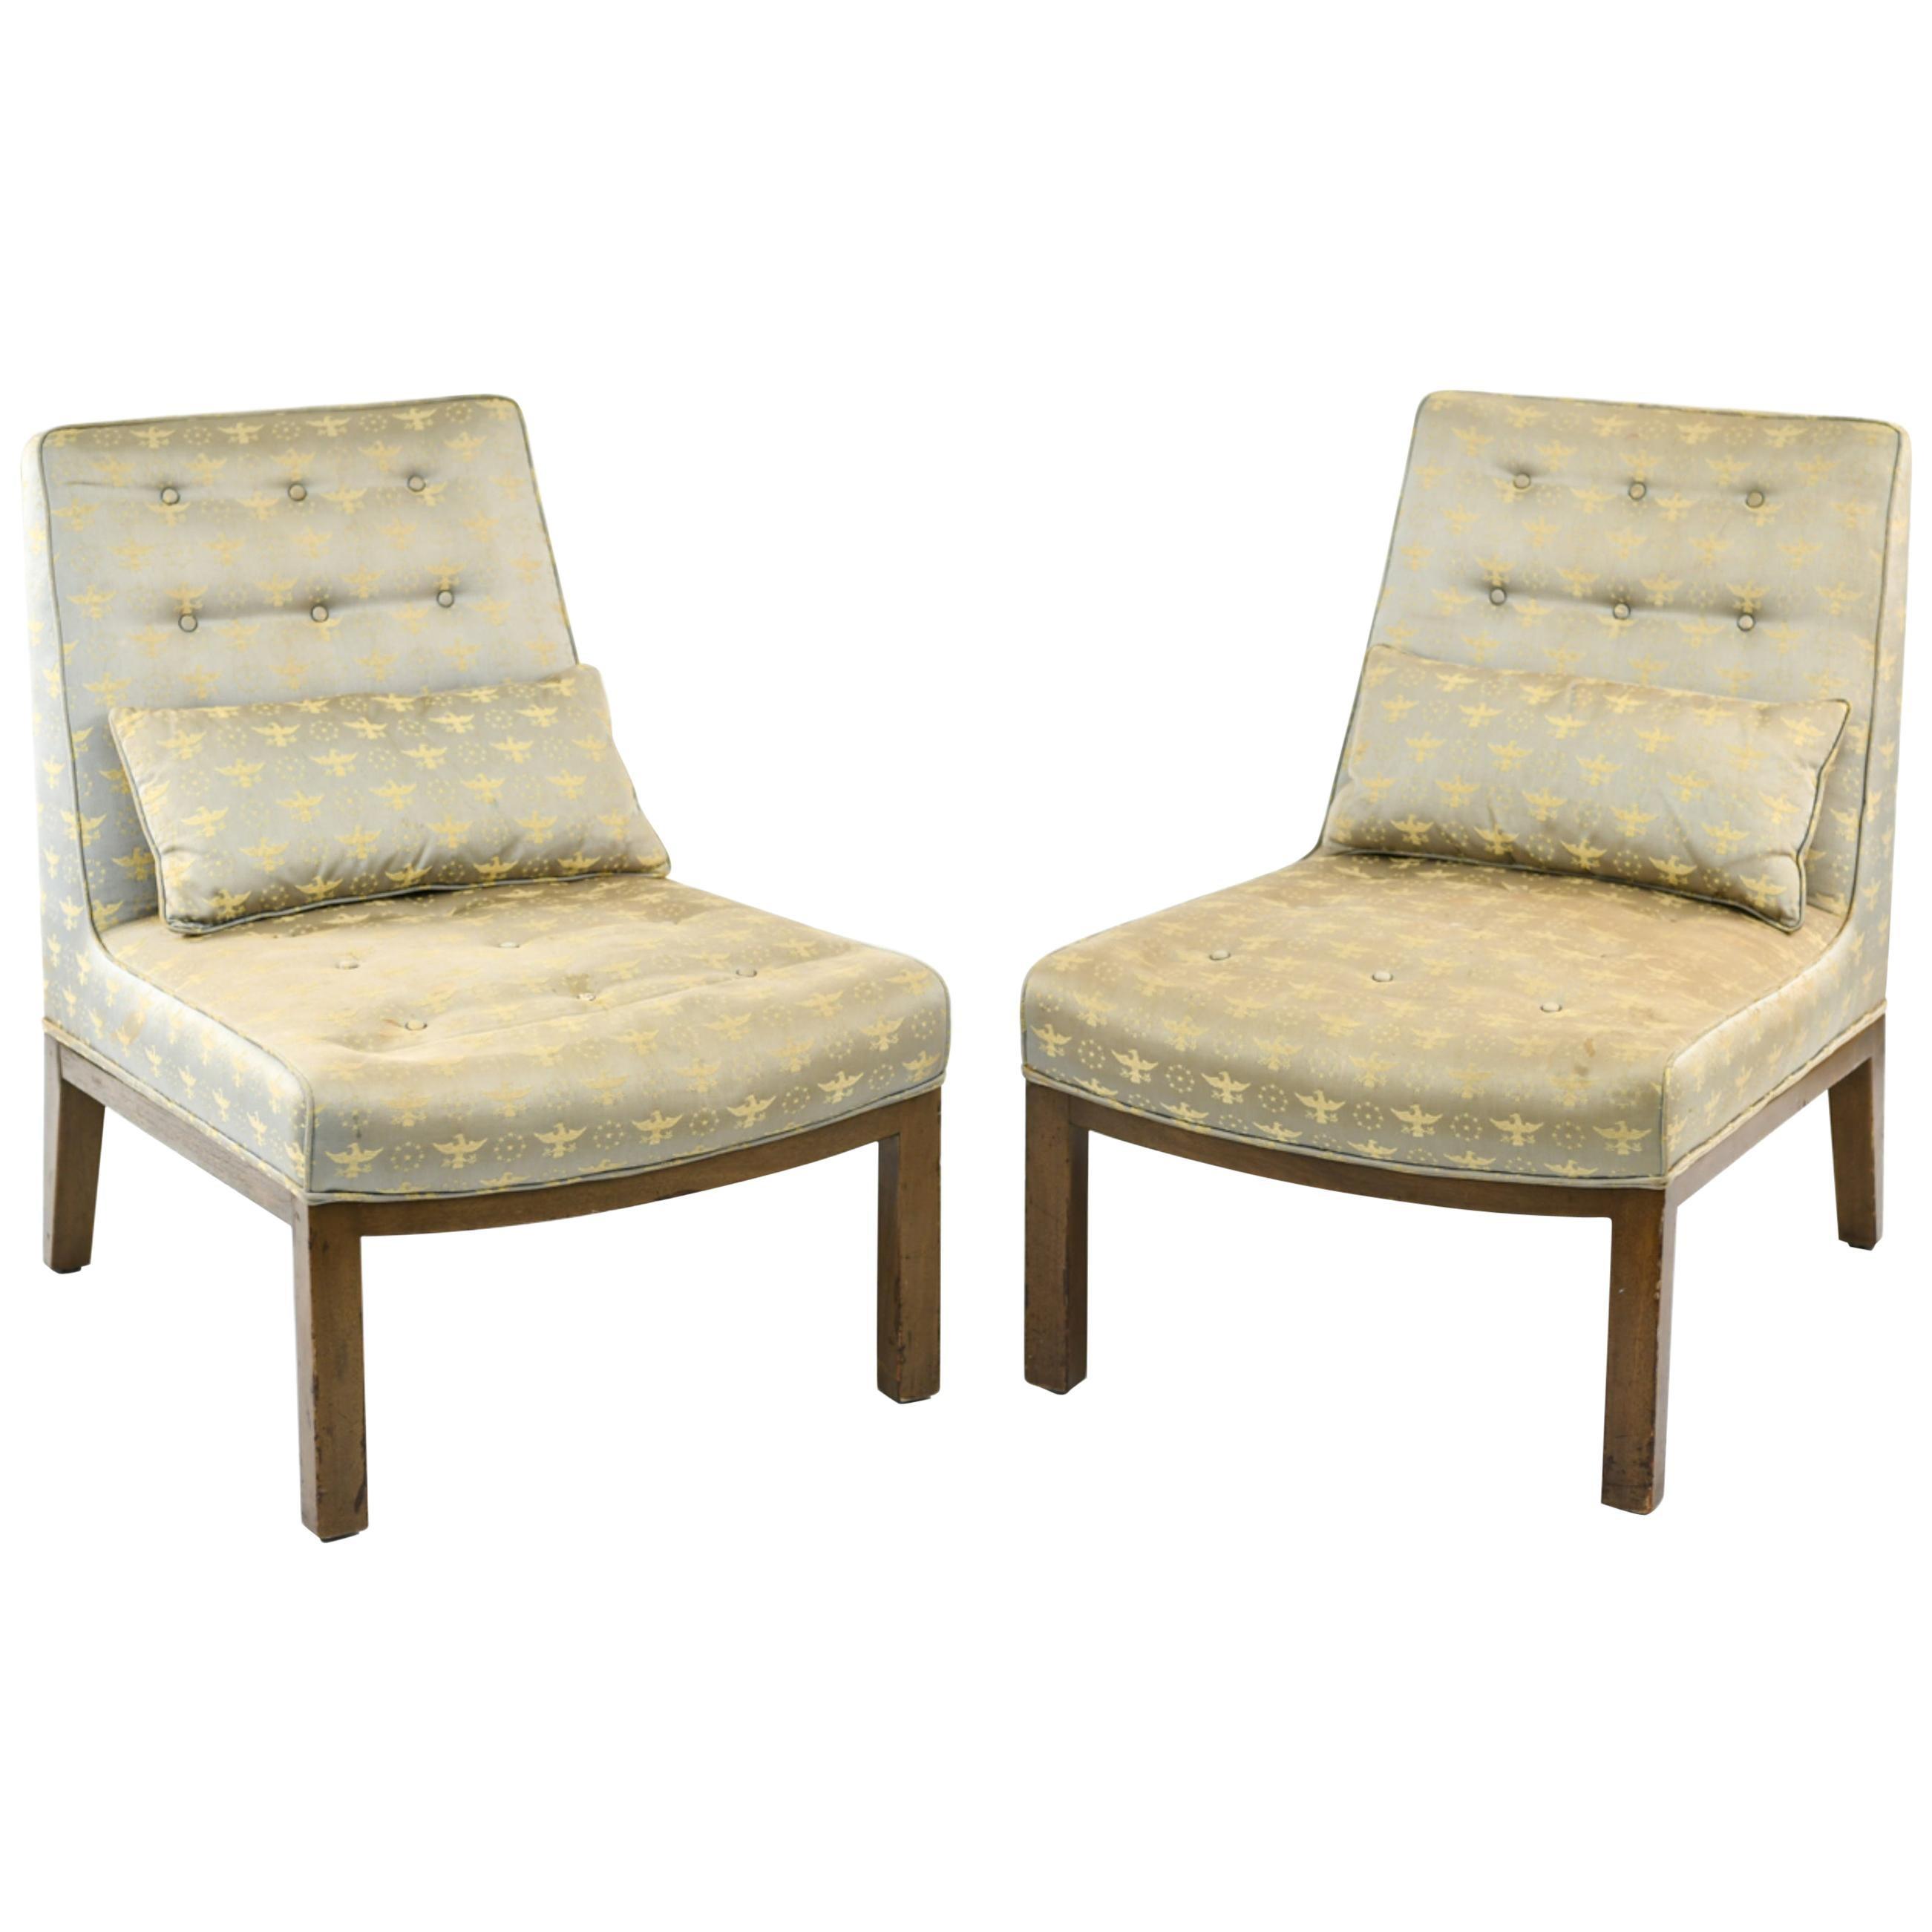 Pair of Edward Wormley for Dunbar Slipper Chairs